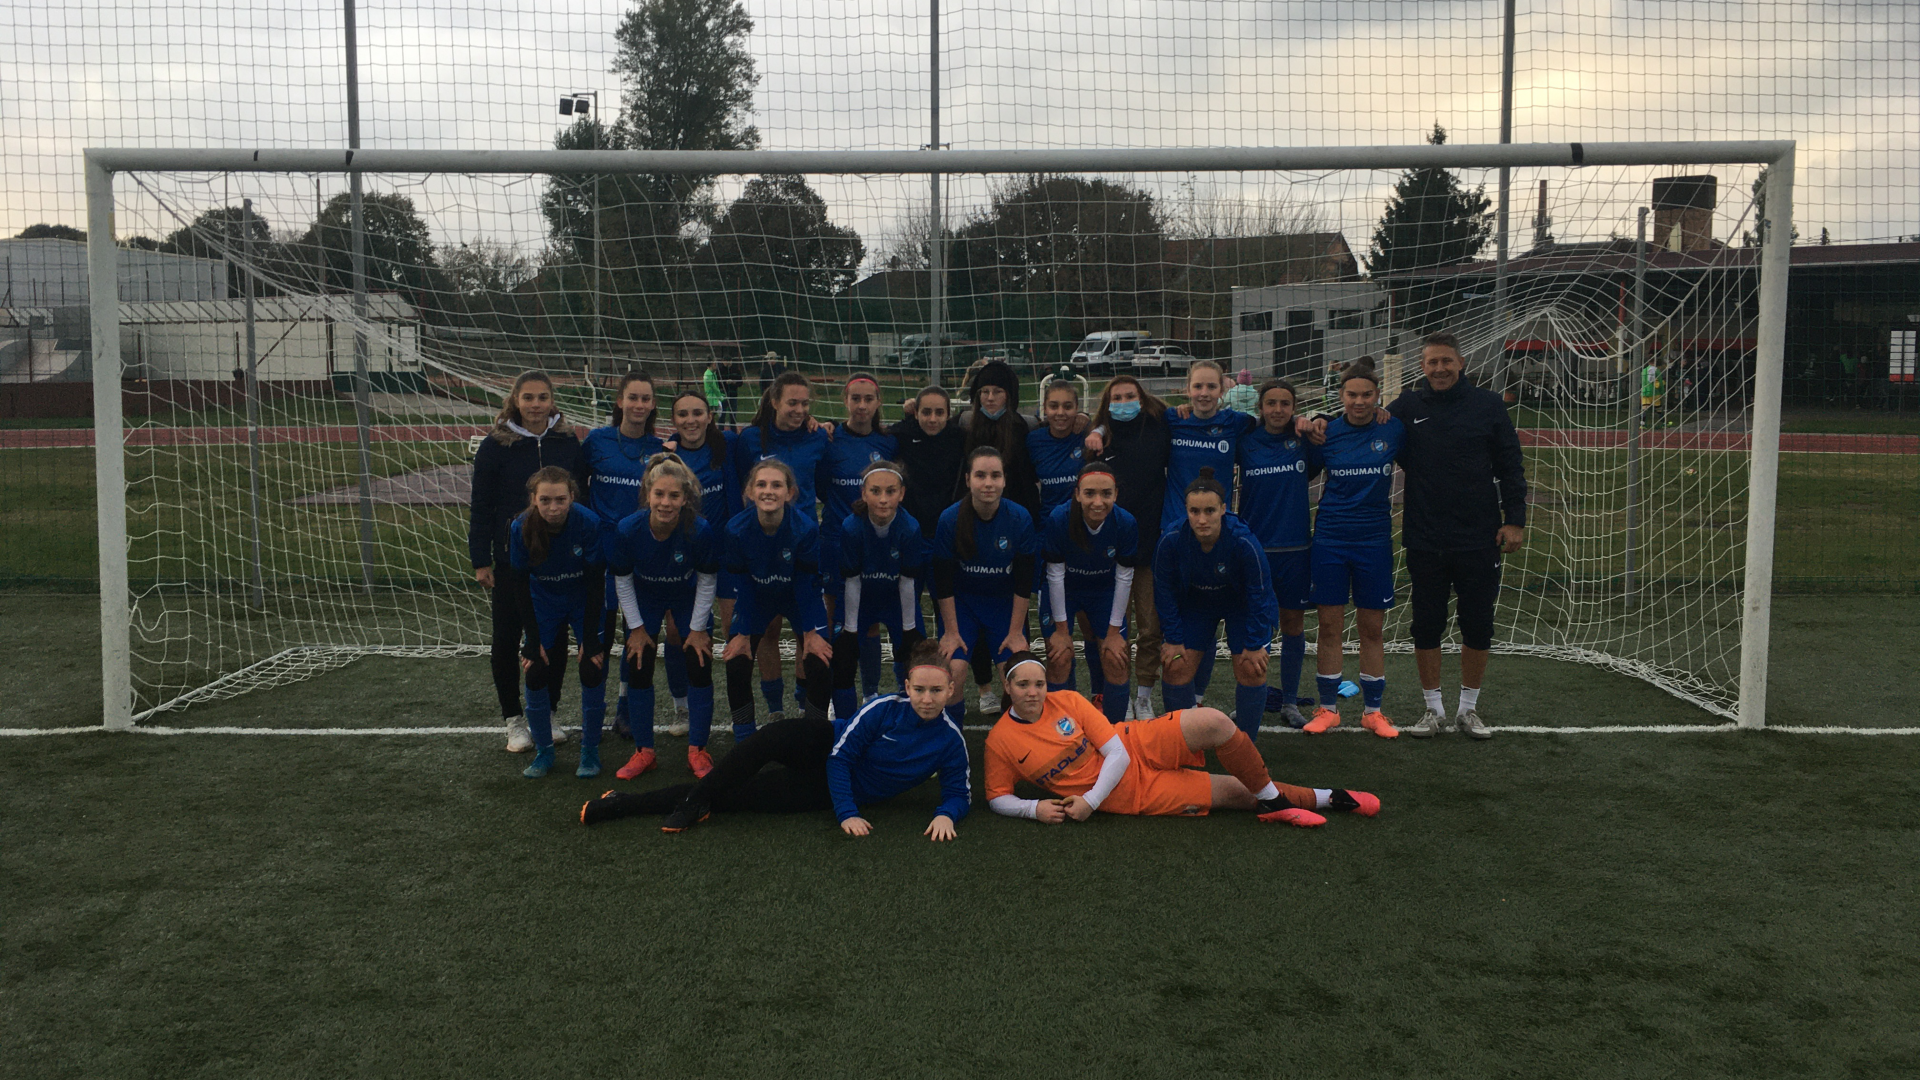 U19: Nem sikerült jól a Budaörs elleni bajnoki